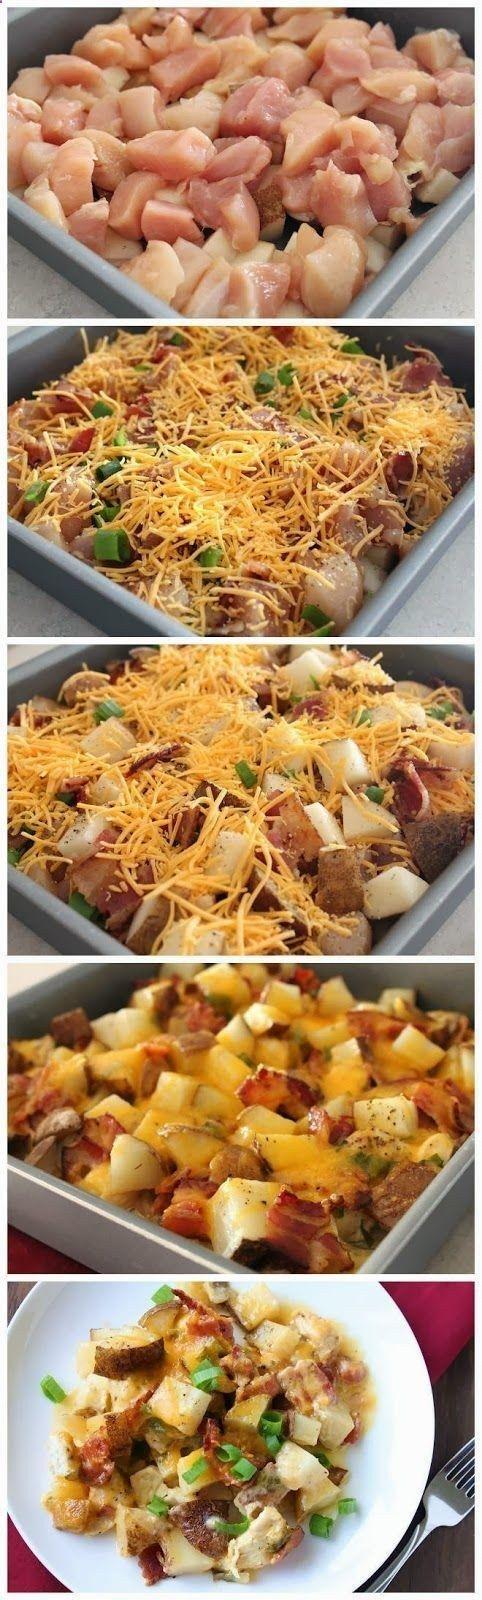 Loaded Baked Potato Chicken Casserole - 3 - 4 medium potatoes diced, (1.5 lbs…